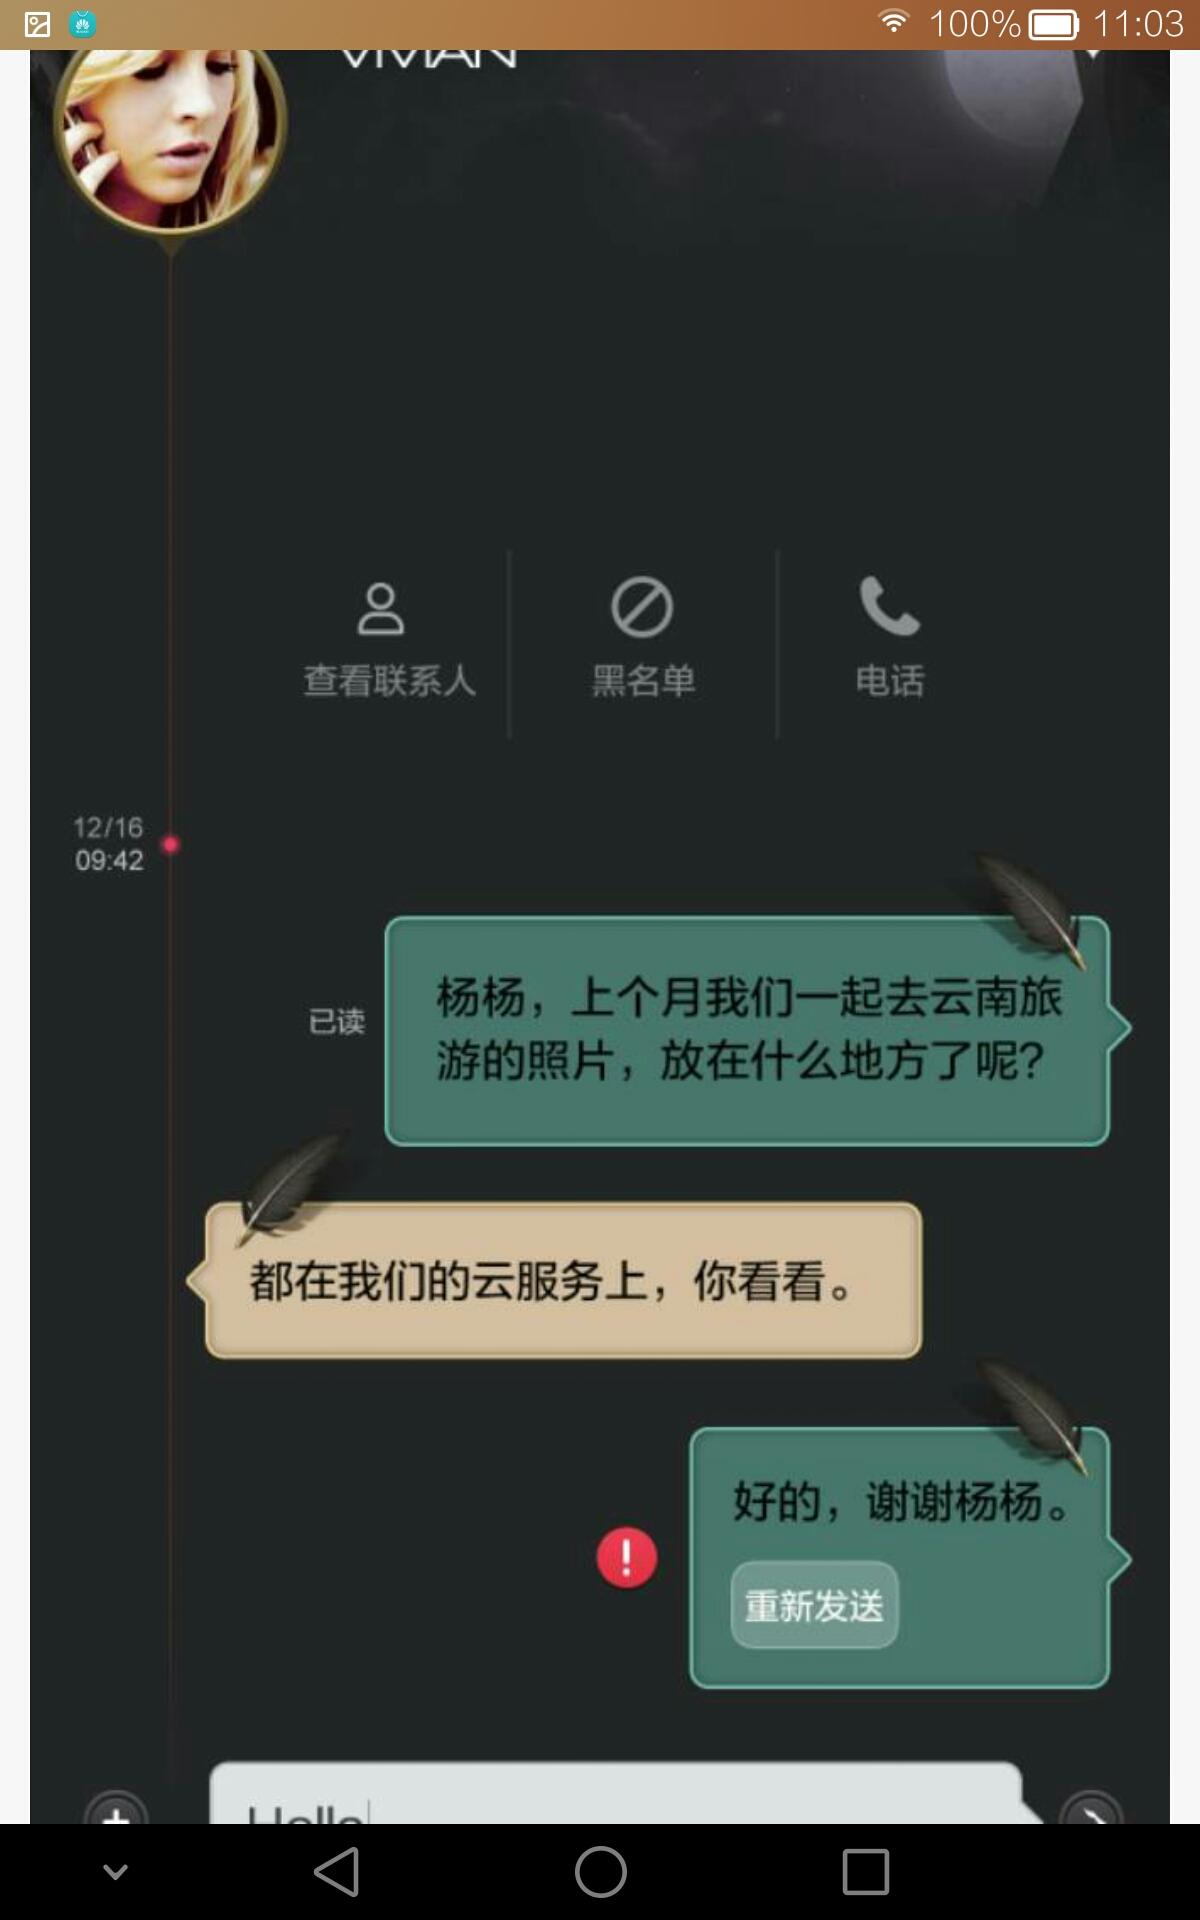 Screenshot_2014-11-29-11-03-44.jpeg